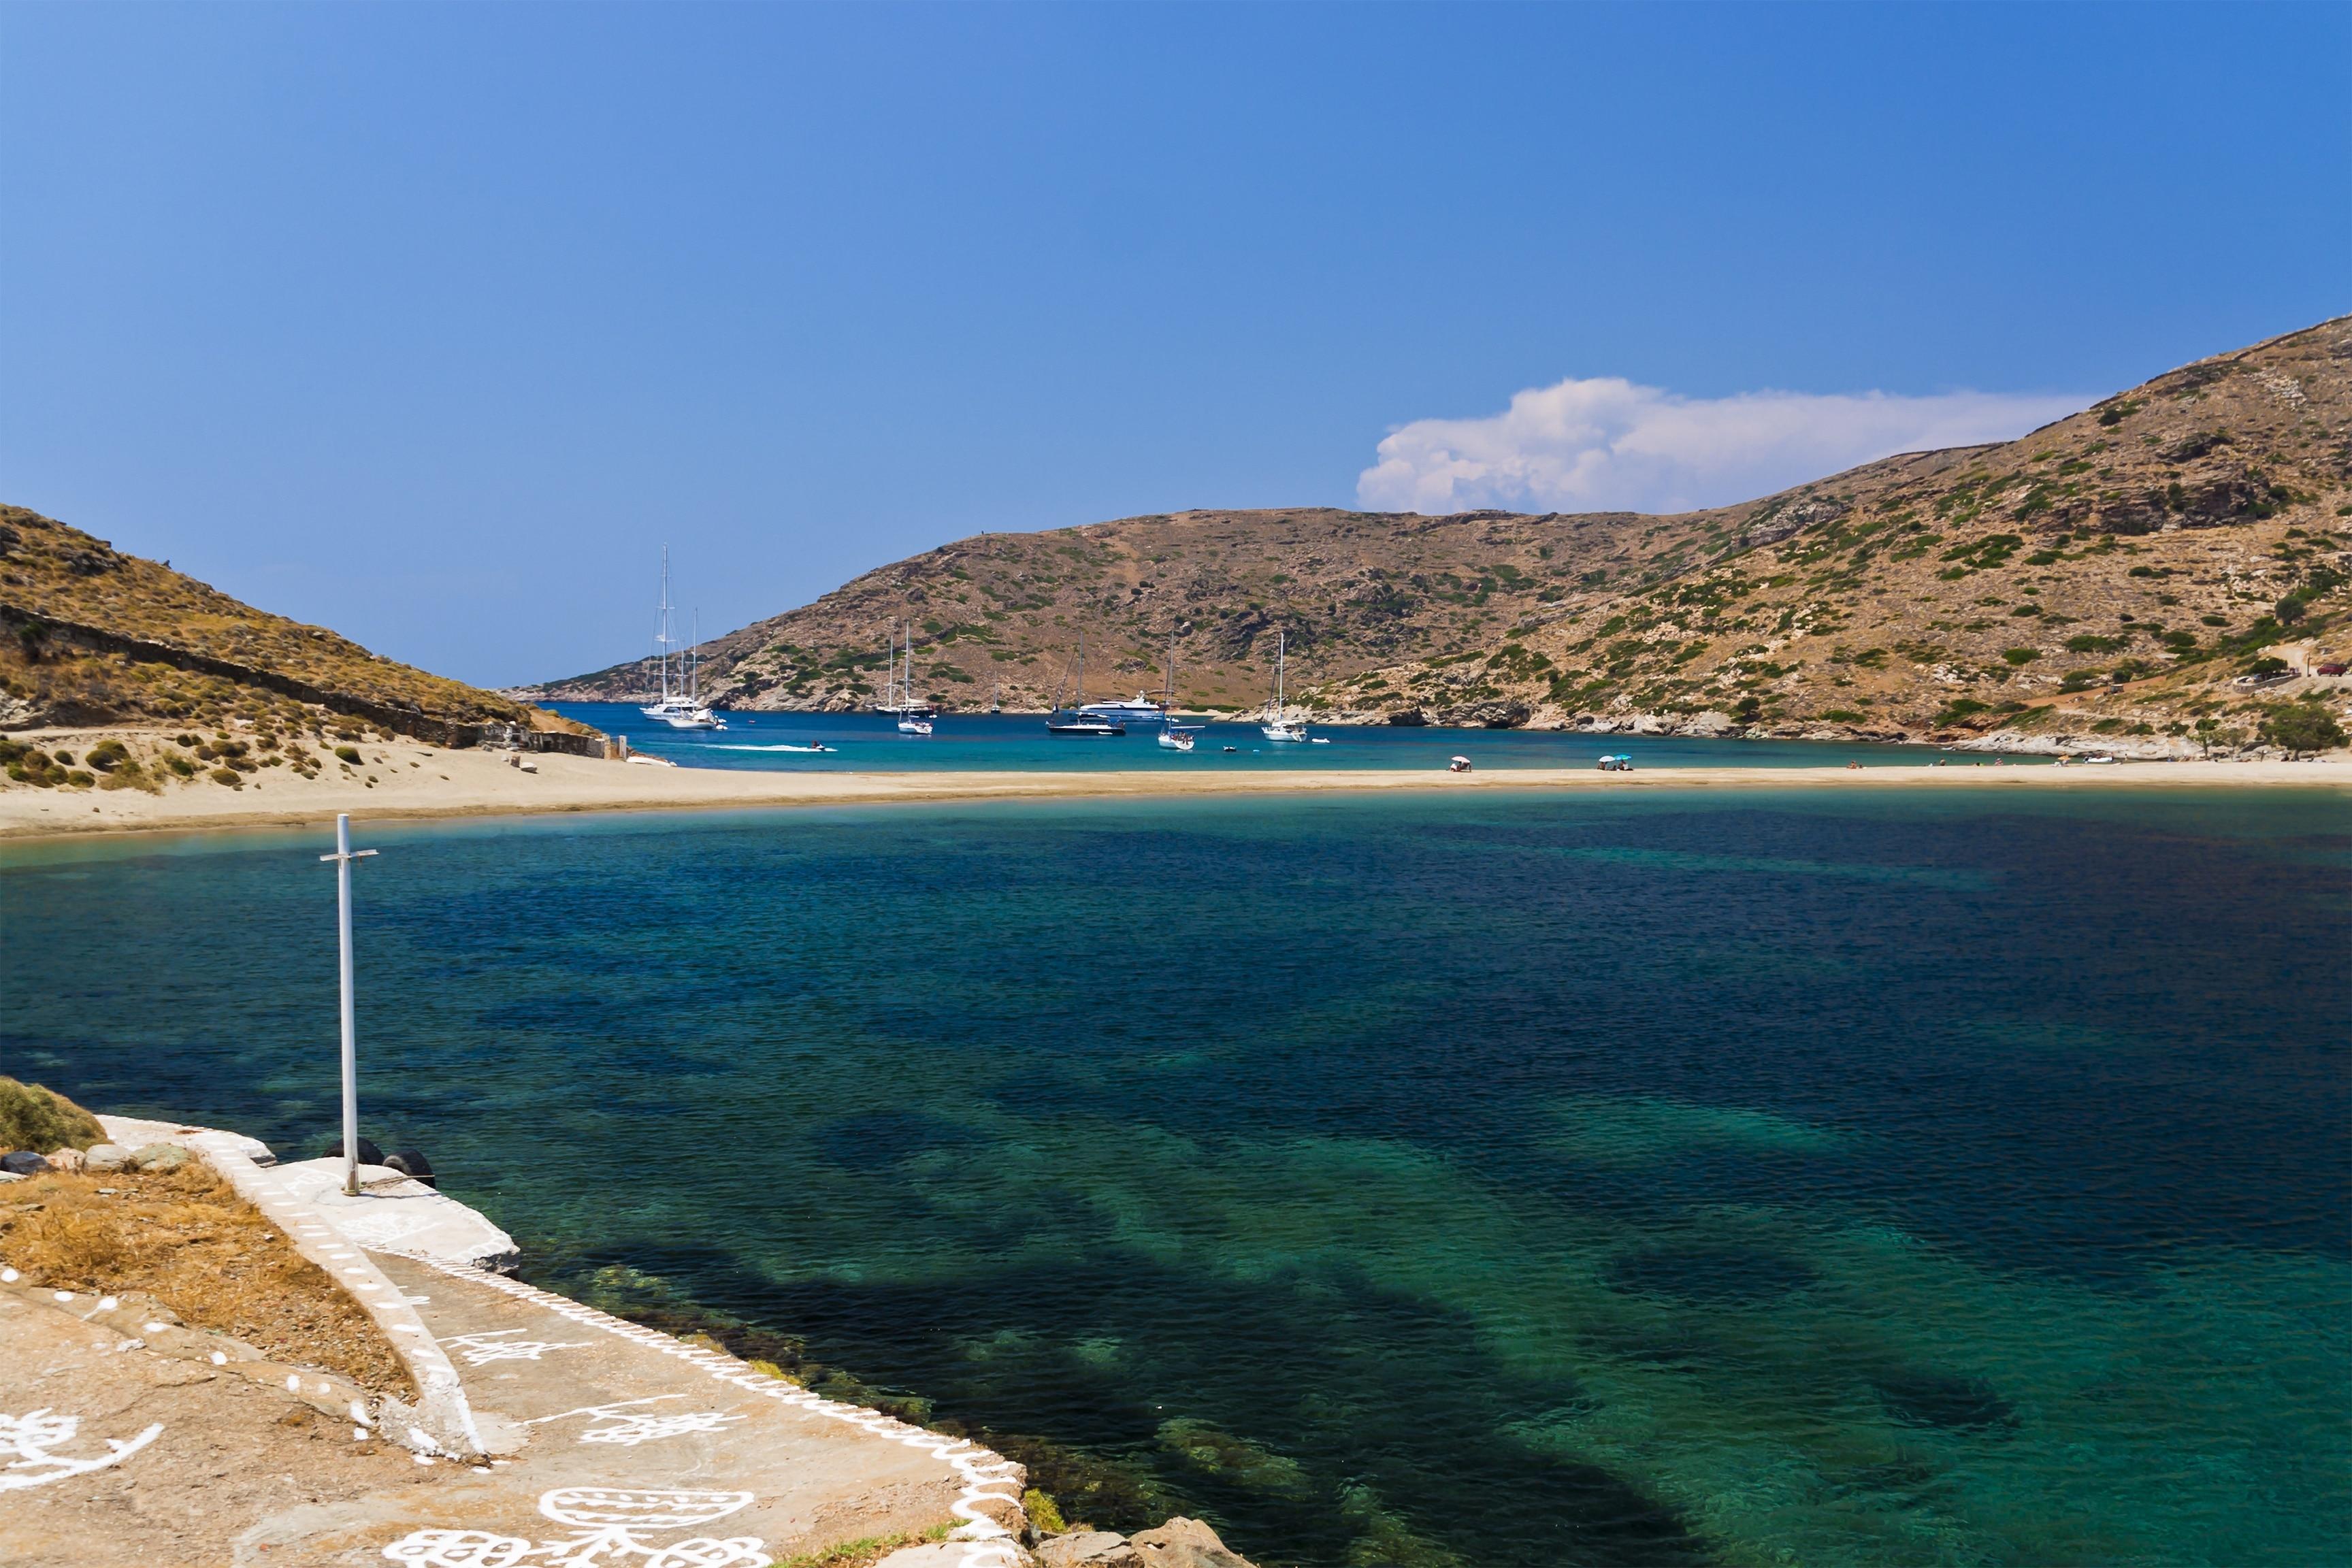 Kea-Kithnos, Südliche Ägäis, Griechenland